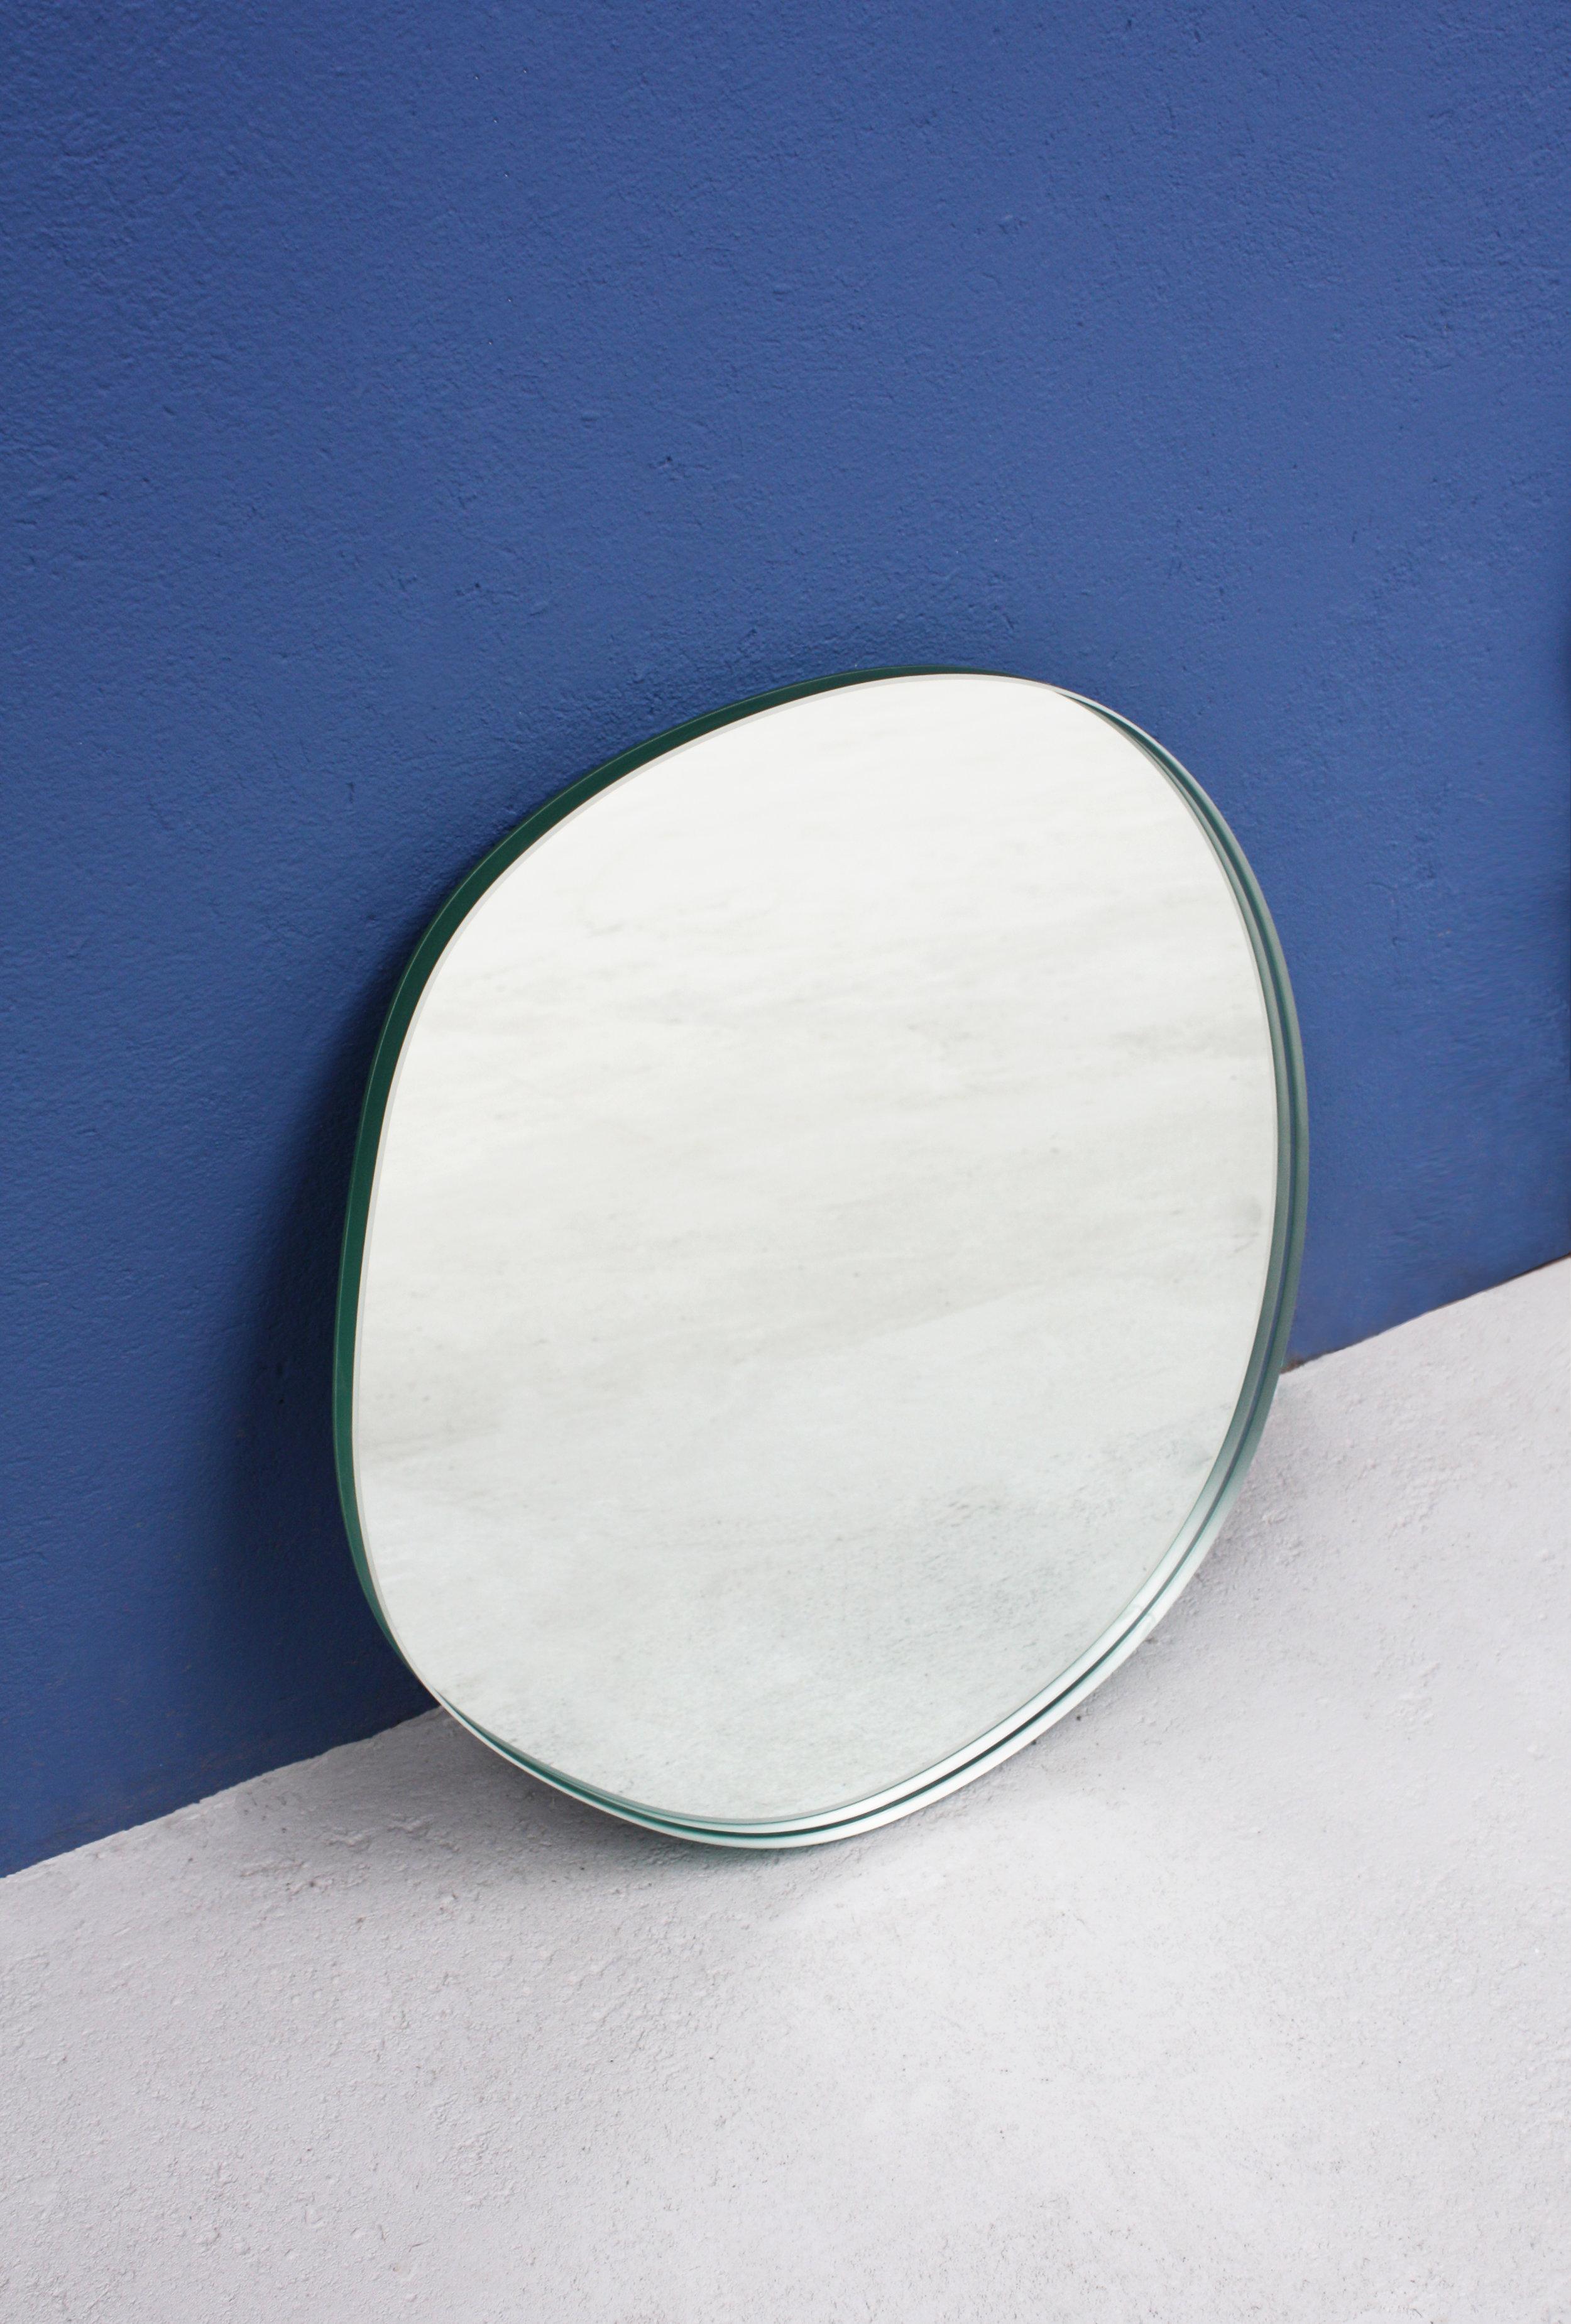 seeingglass_offround_britvannerven_sabinemarcelis_CLEAR.jpg